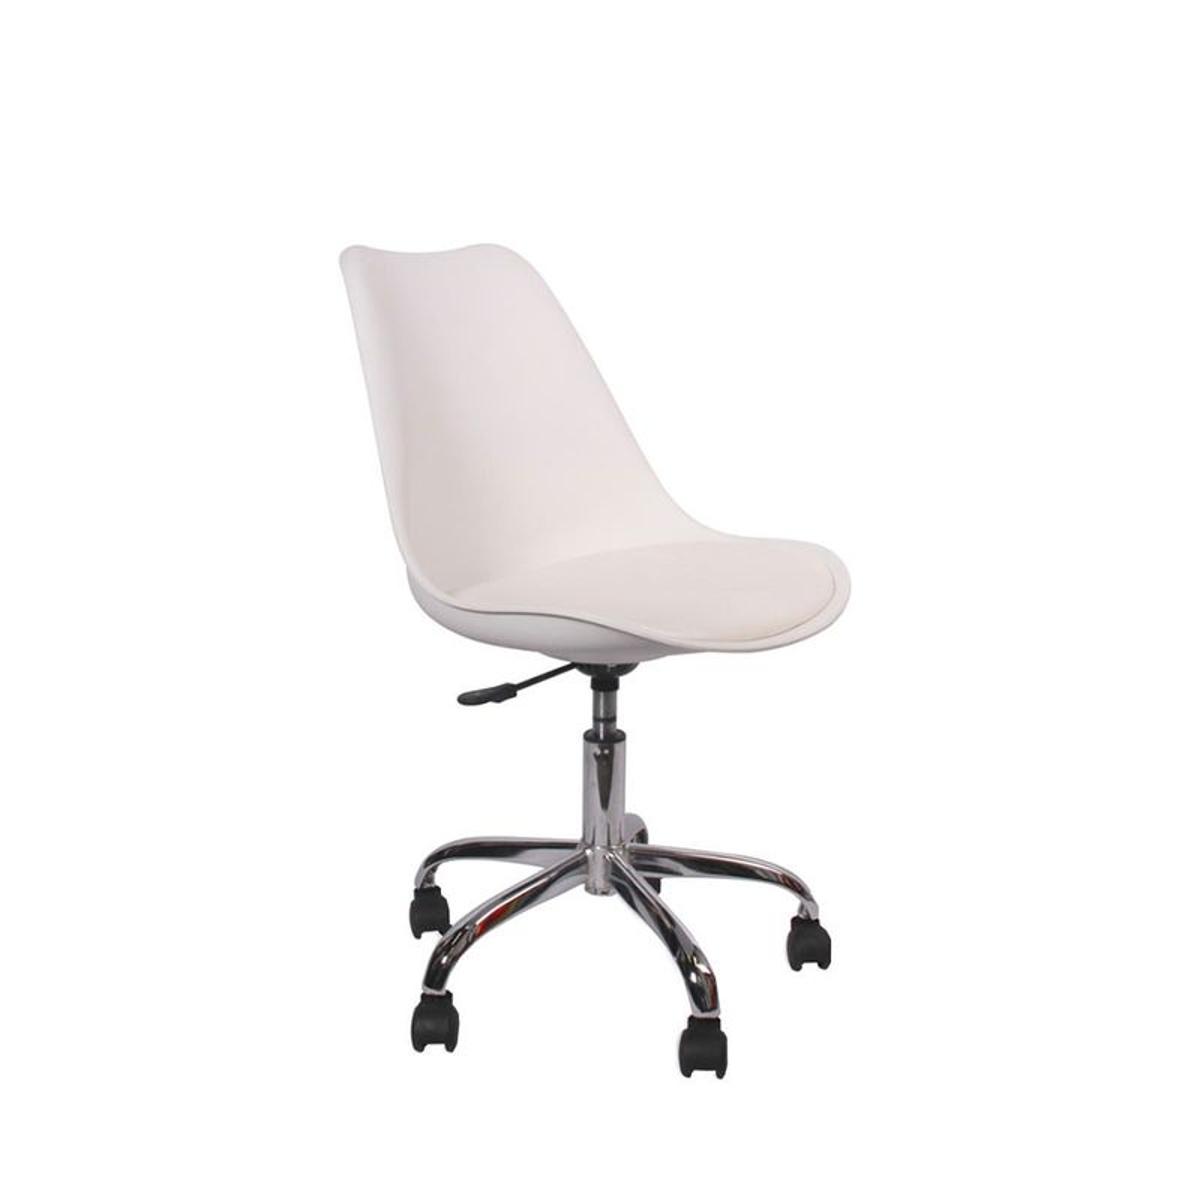 Ormond Office - Chaise de bureau